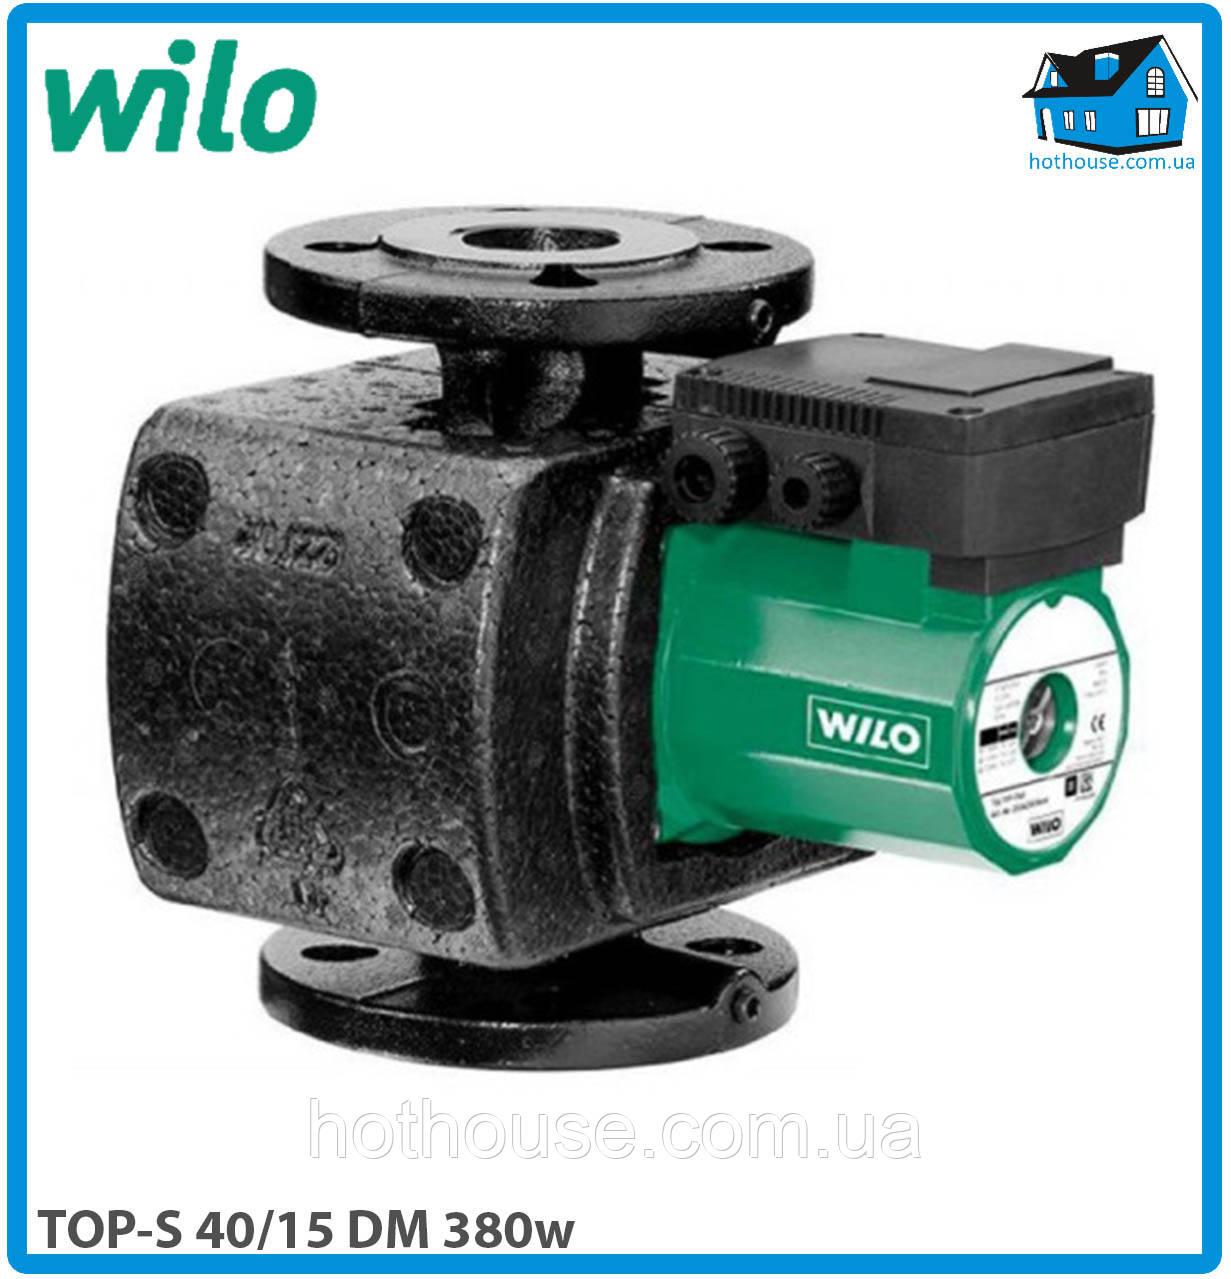 Насос циркуляционный Wilo TOP-S 40/15 DM 380w (оригинал)